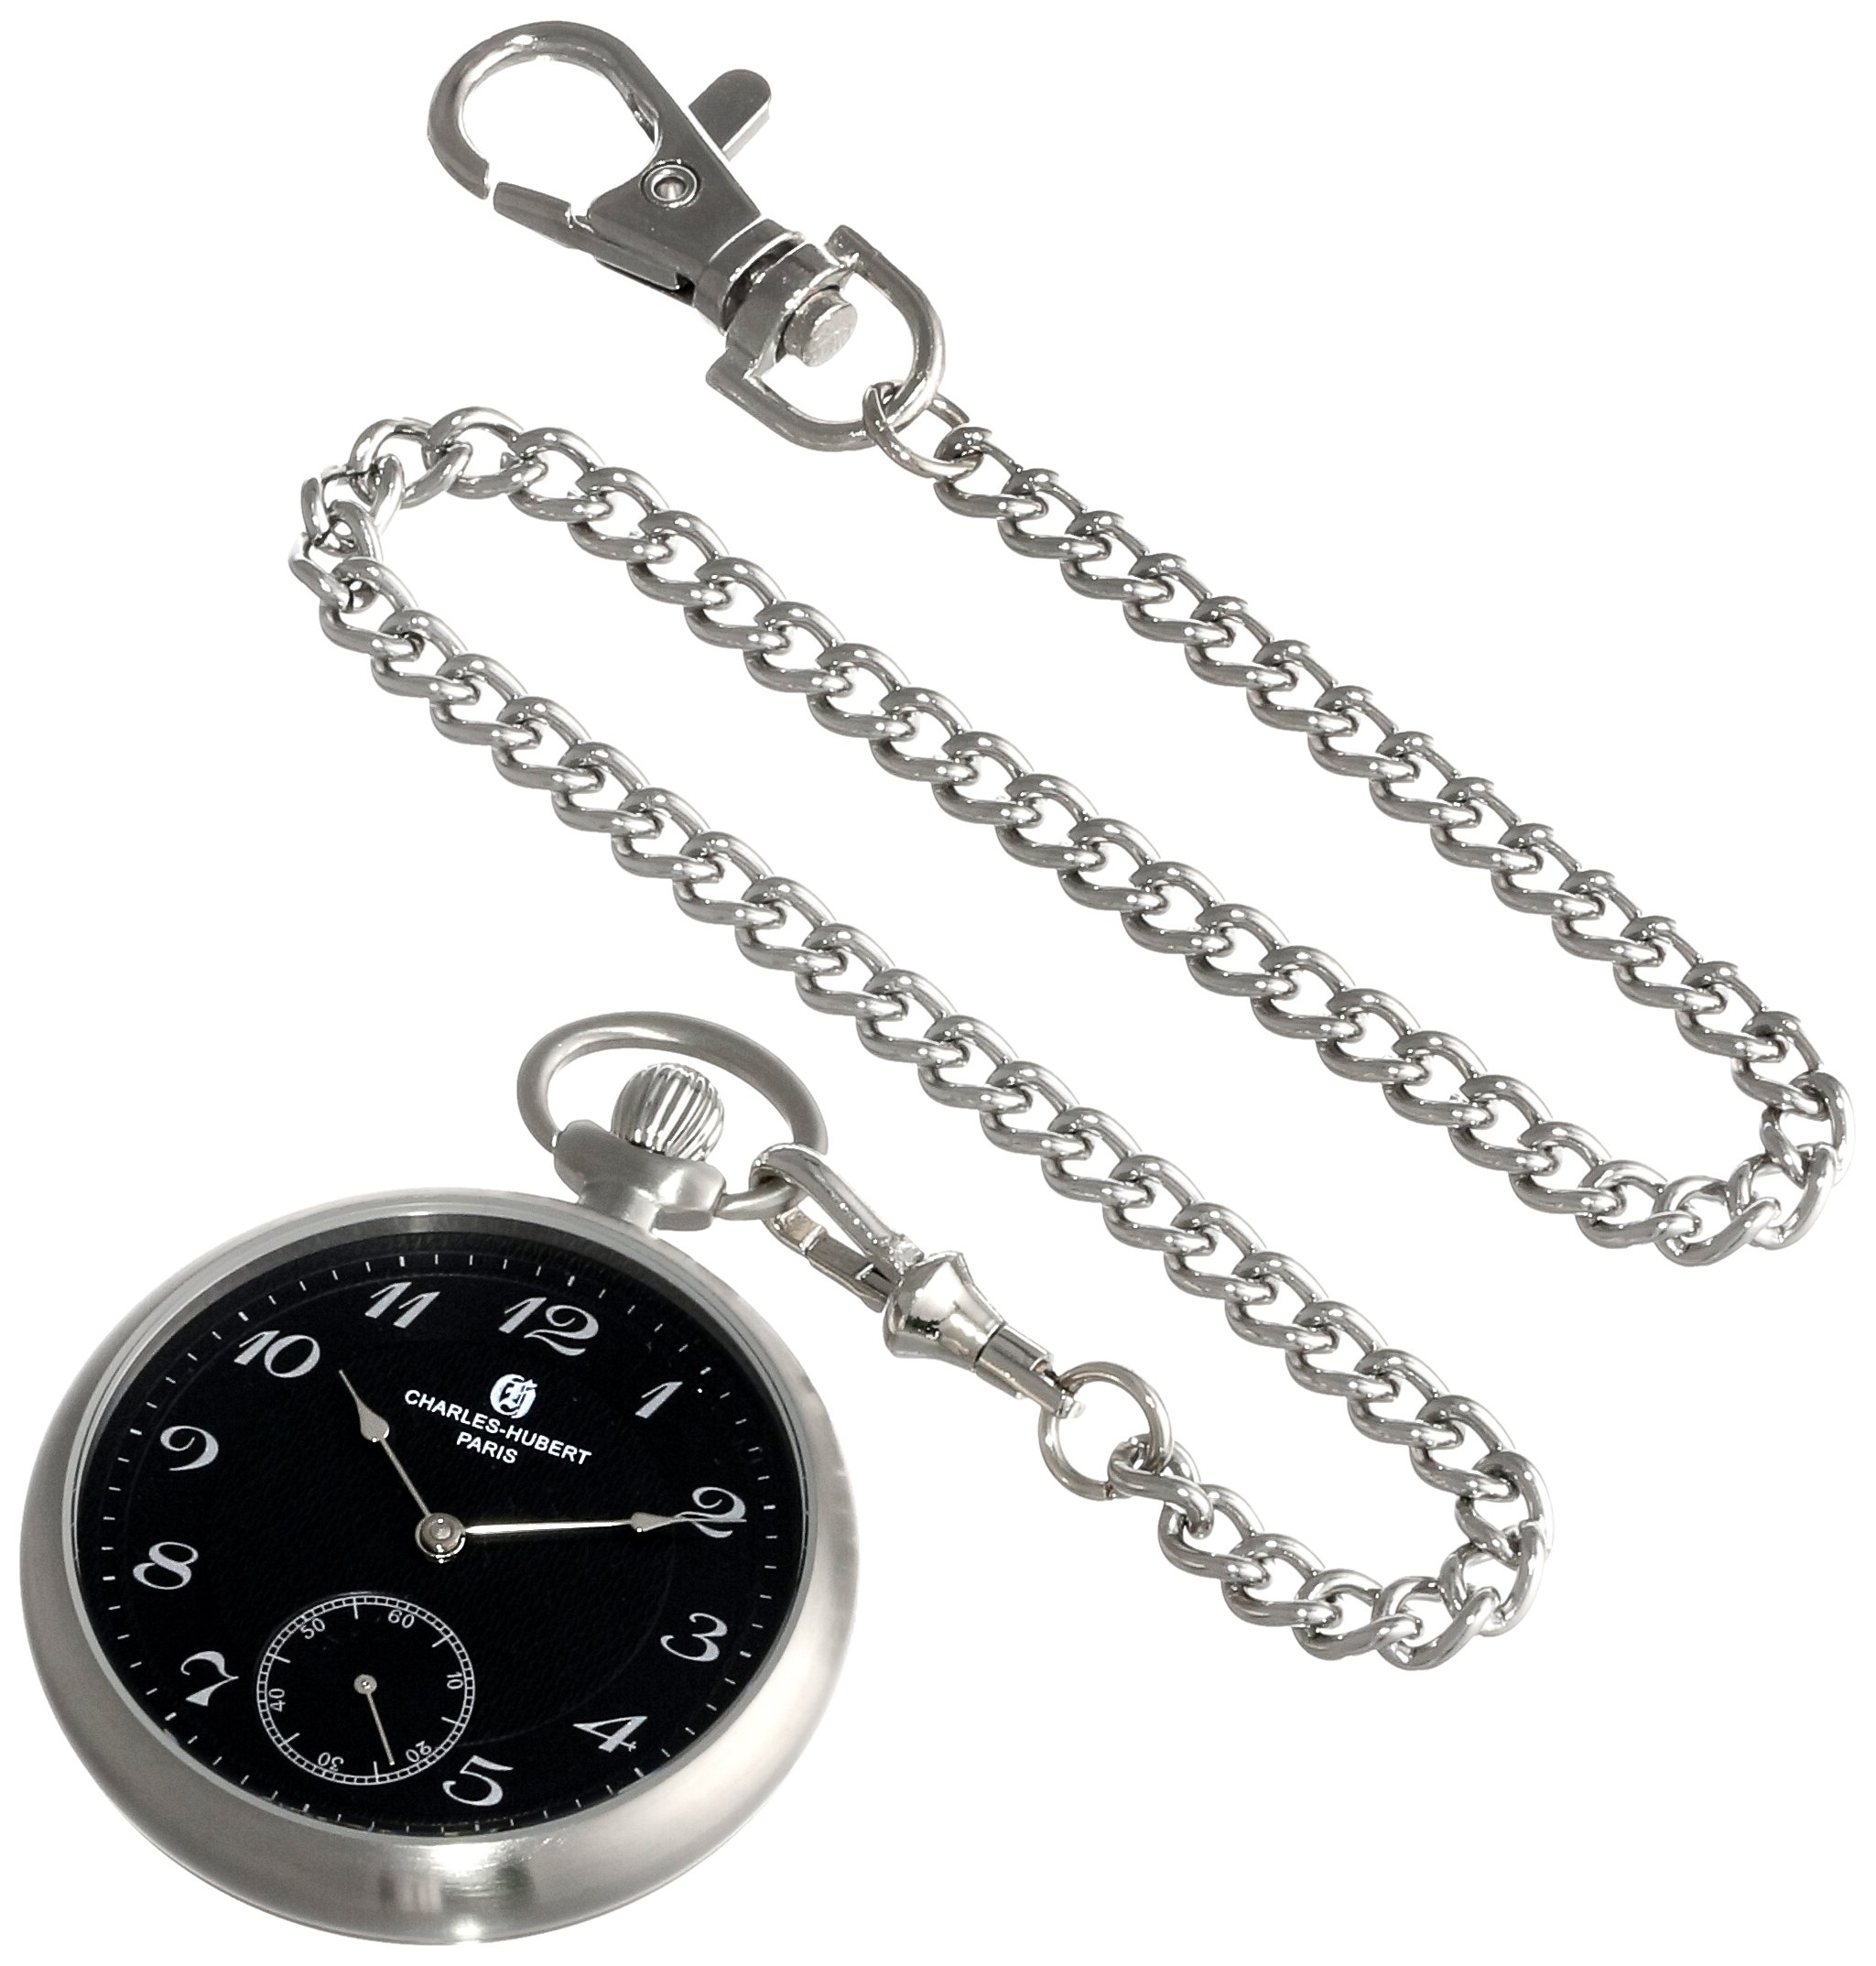 Charles-Hubert, Paris 3955-B Premium Collection Analog Display Mechanical Hand Wind Pocket Watch